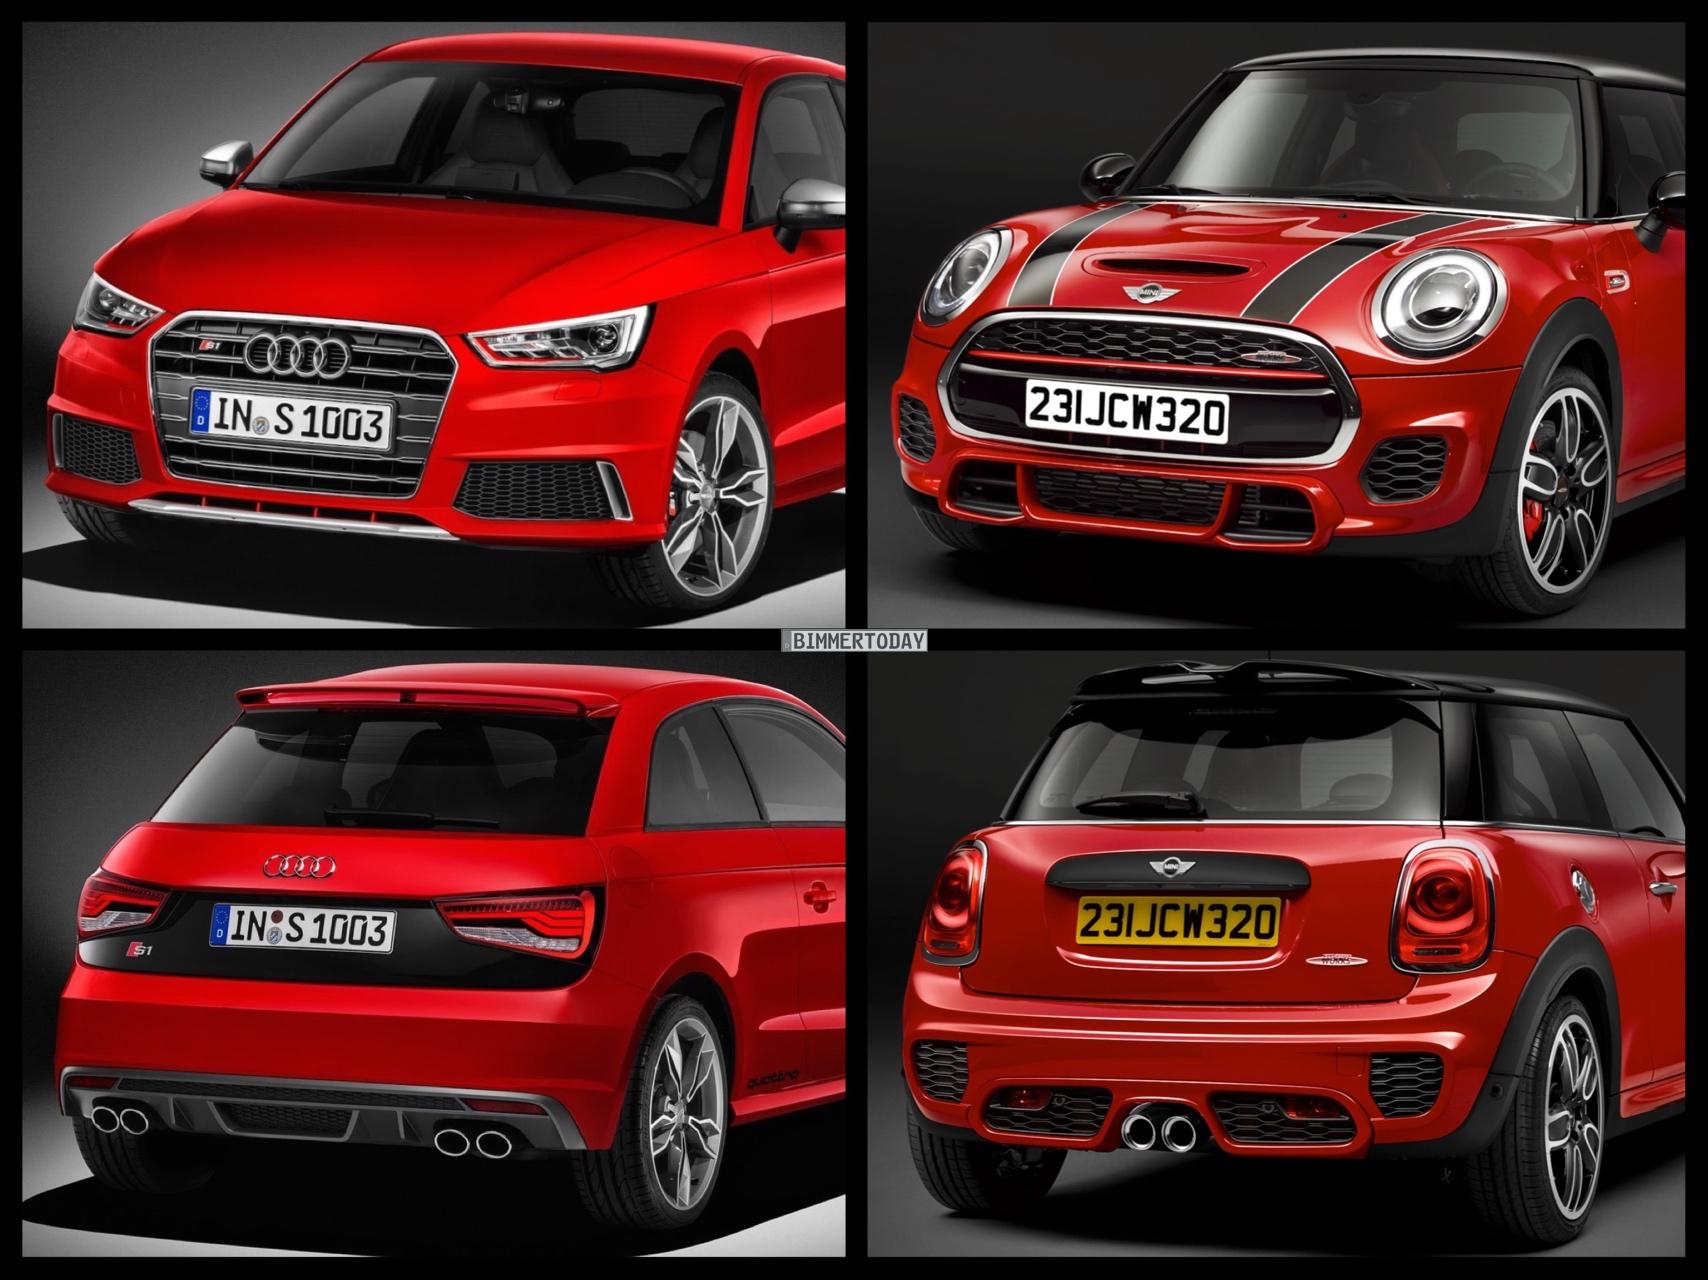 MINI John Cooper Works 2015 Audi S1 2015 Bild Vergleich 04